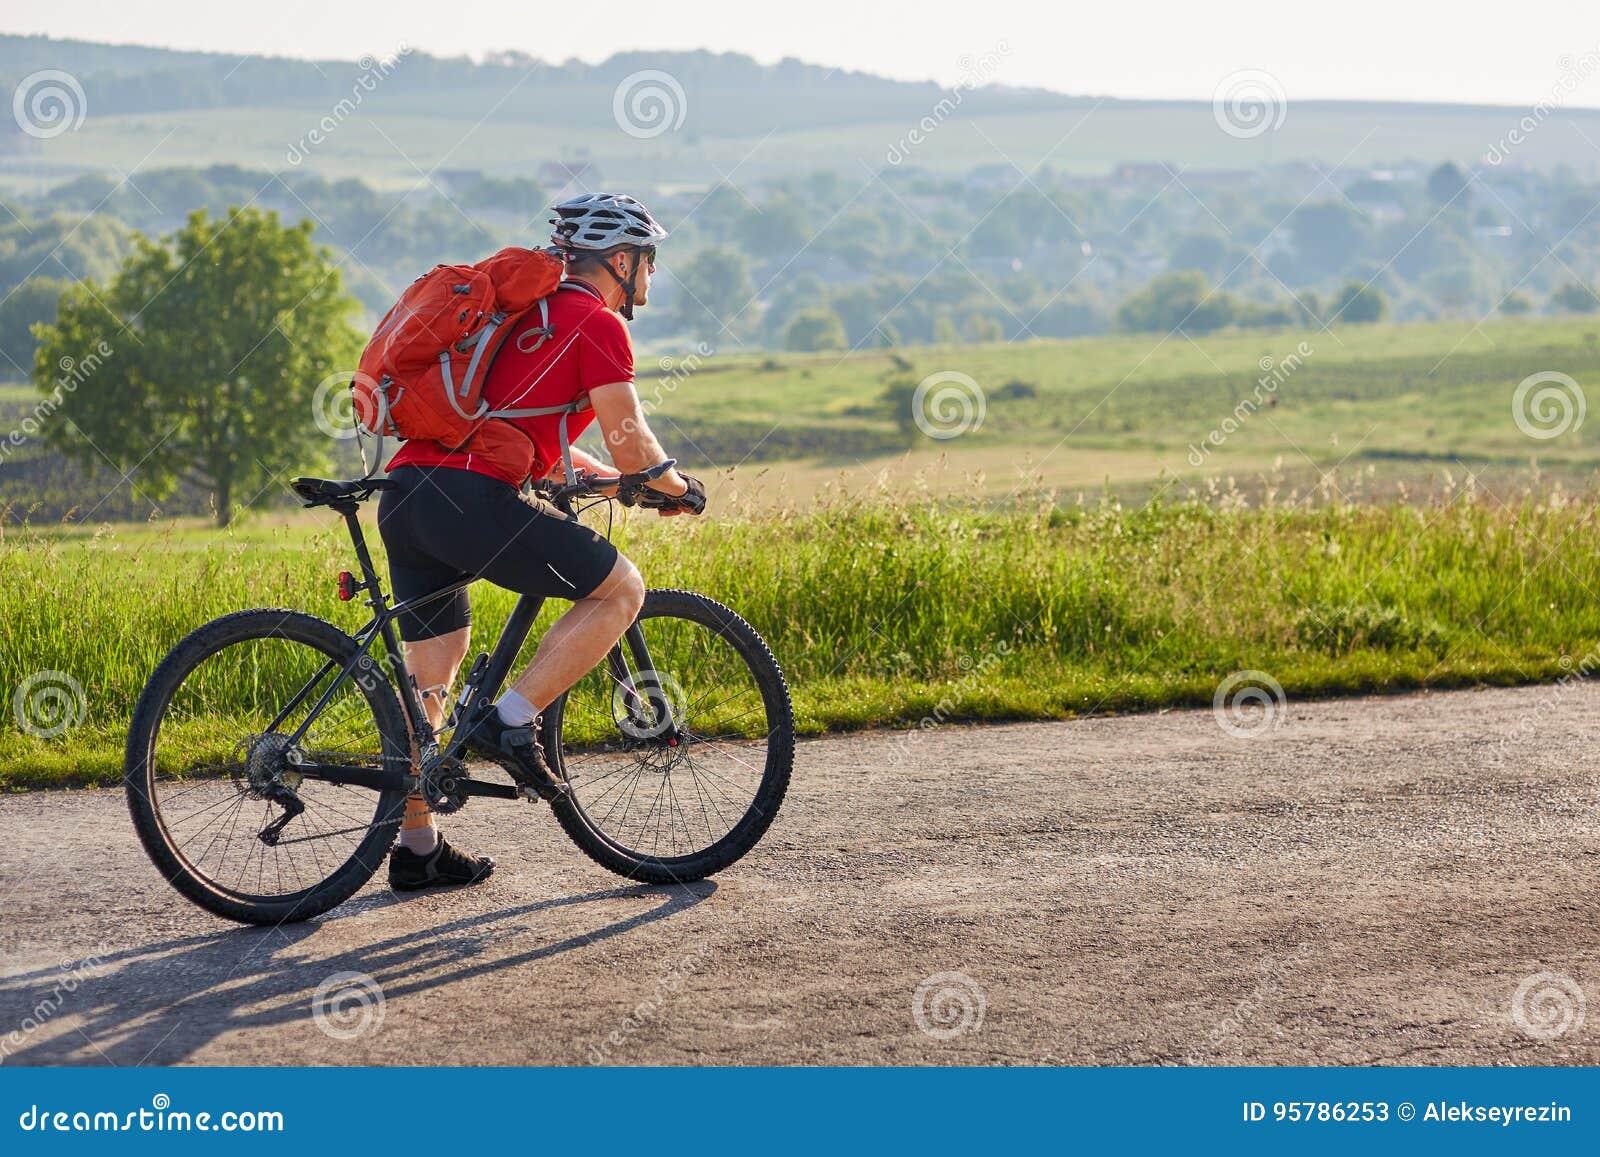 Potrtrait του ποδηλάτη σε έναν μακρύ δρόμο στην επαρχία ενάντια στο θερινό τοπίο